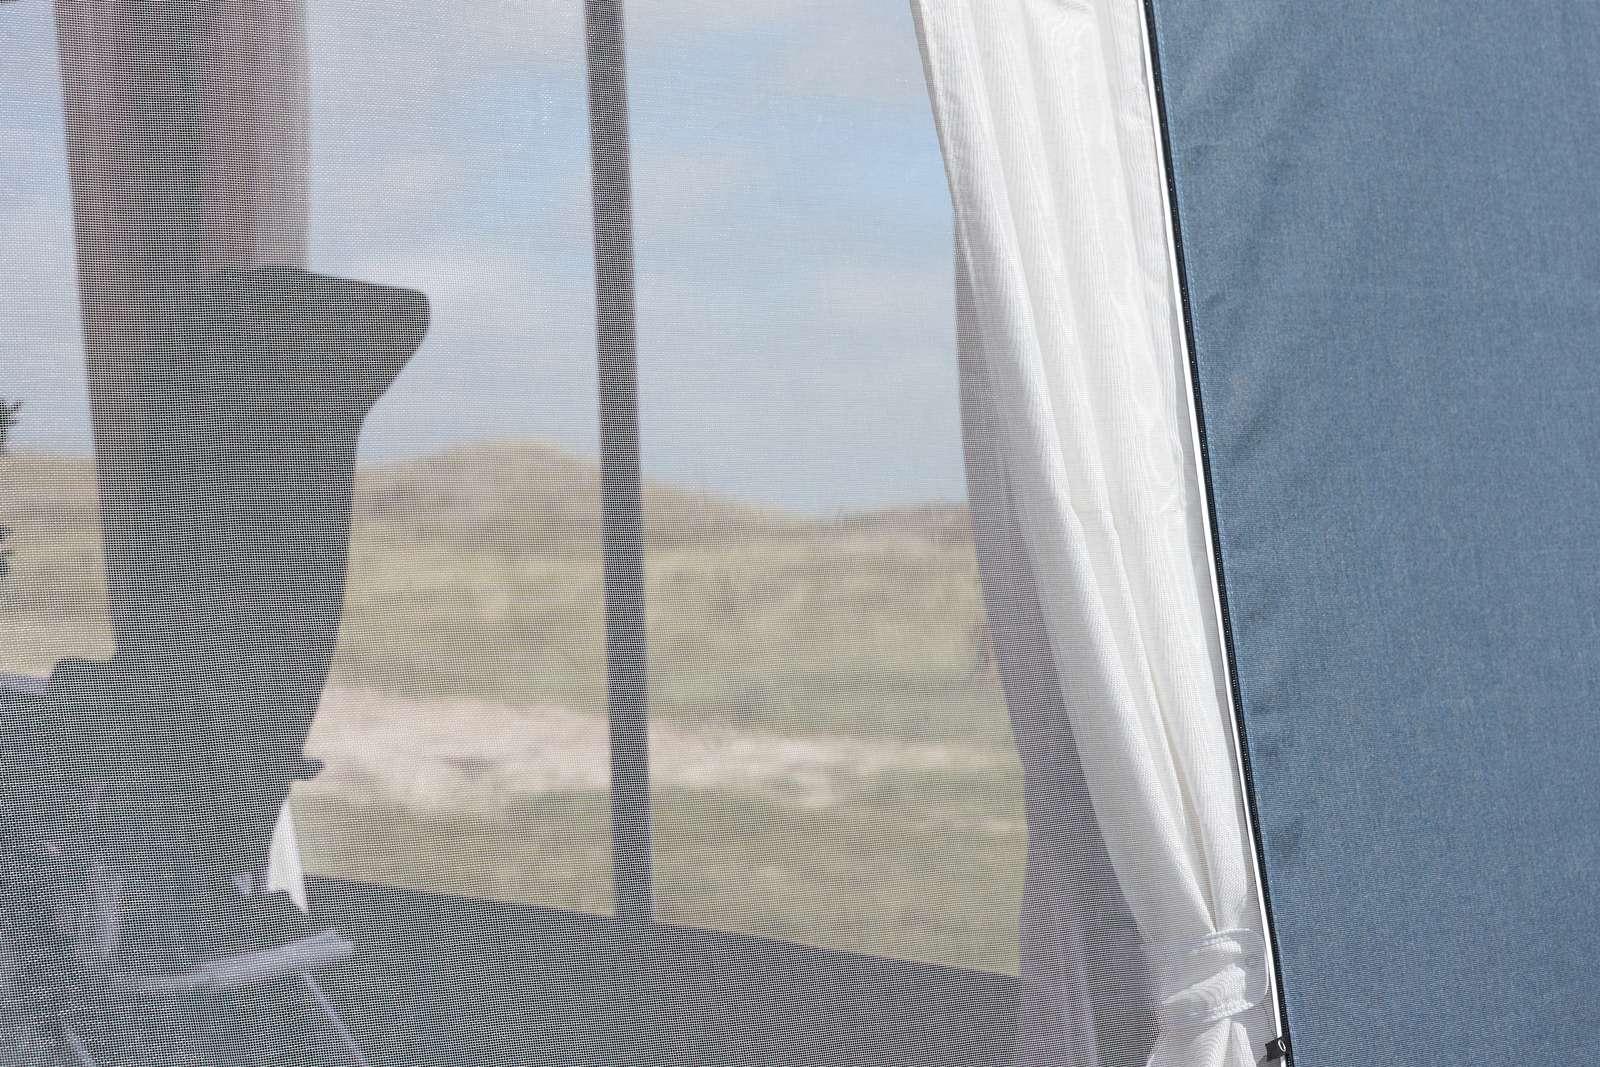 isabella capri north awning 2019 camping international. Black Bedroom Furniture Sets. Home Design Ideas